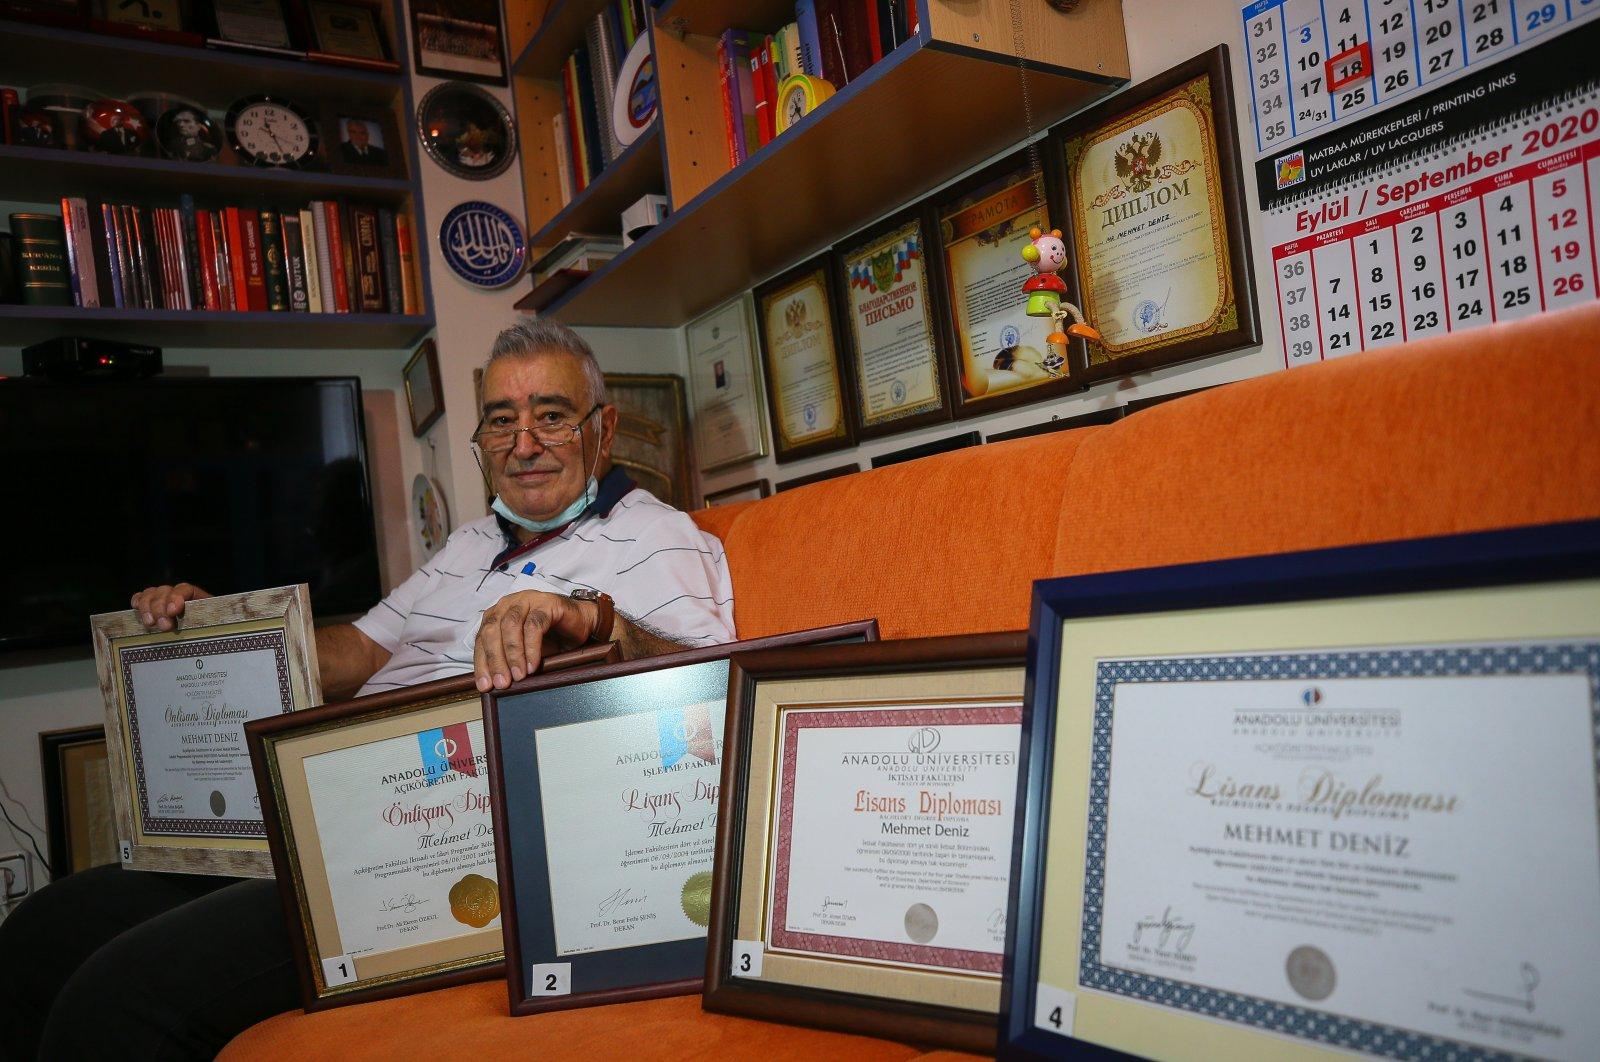 Mehmet Deniz shows his diplomas in his home, in Izmir, western Turkey, Aug. 19, 2020. (AA Photo)